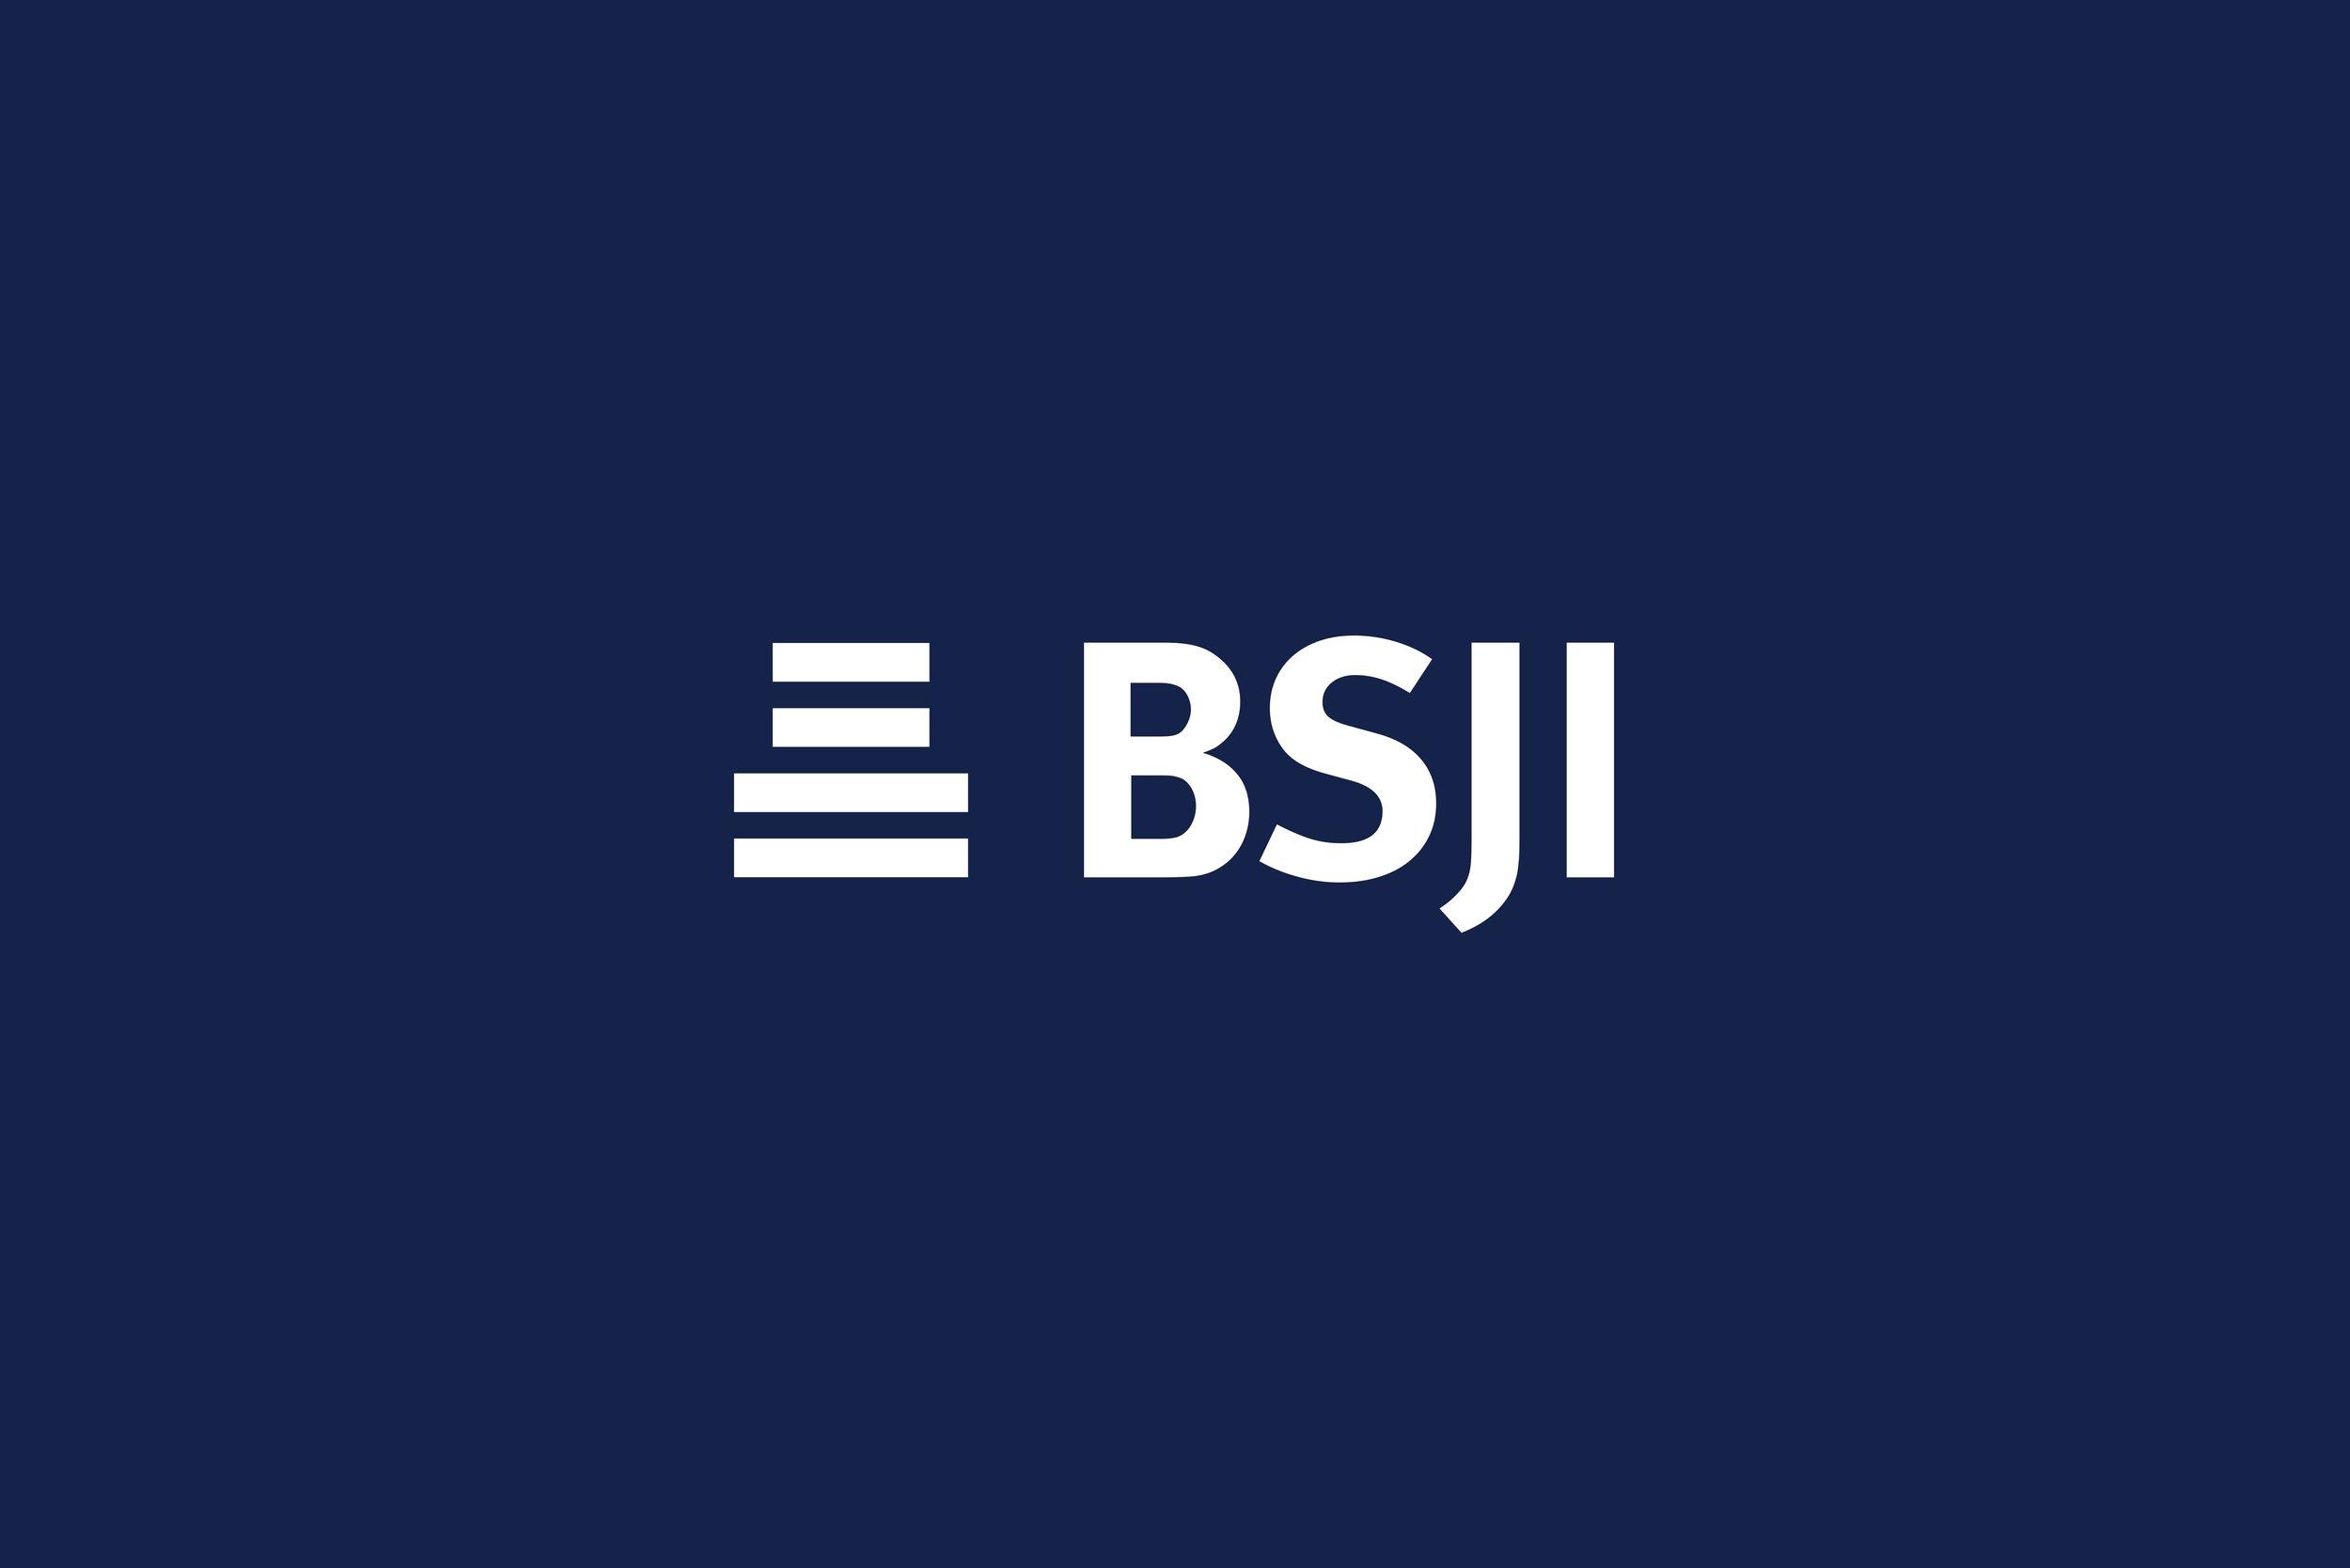 1_BSJI logo.jpg